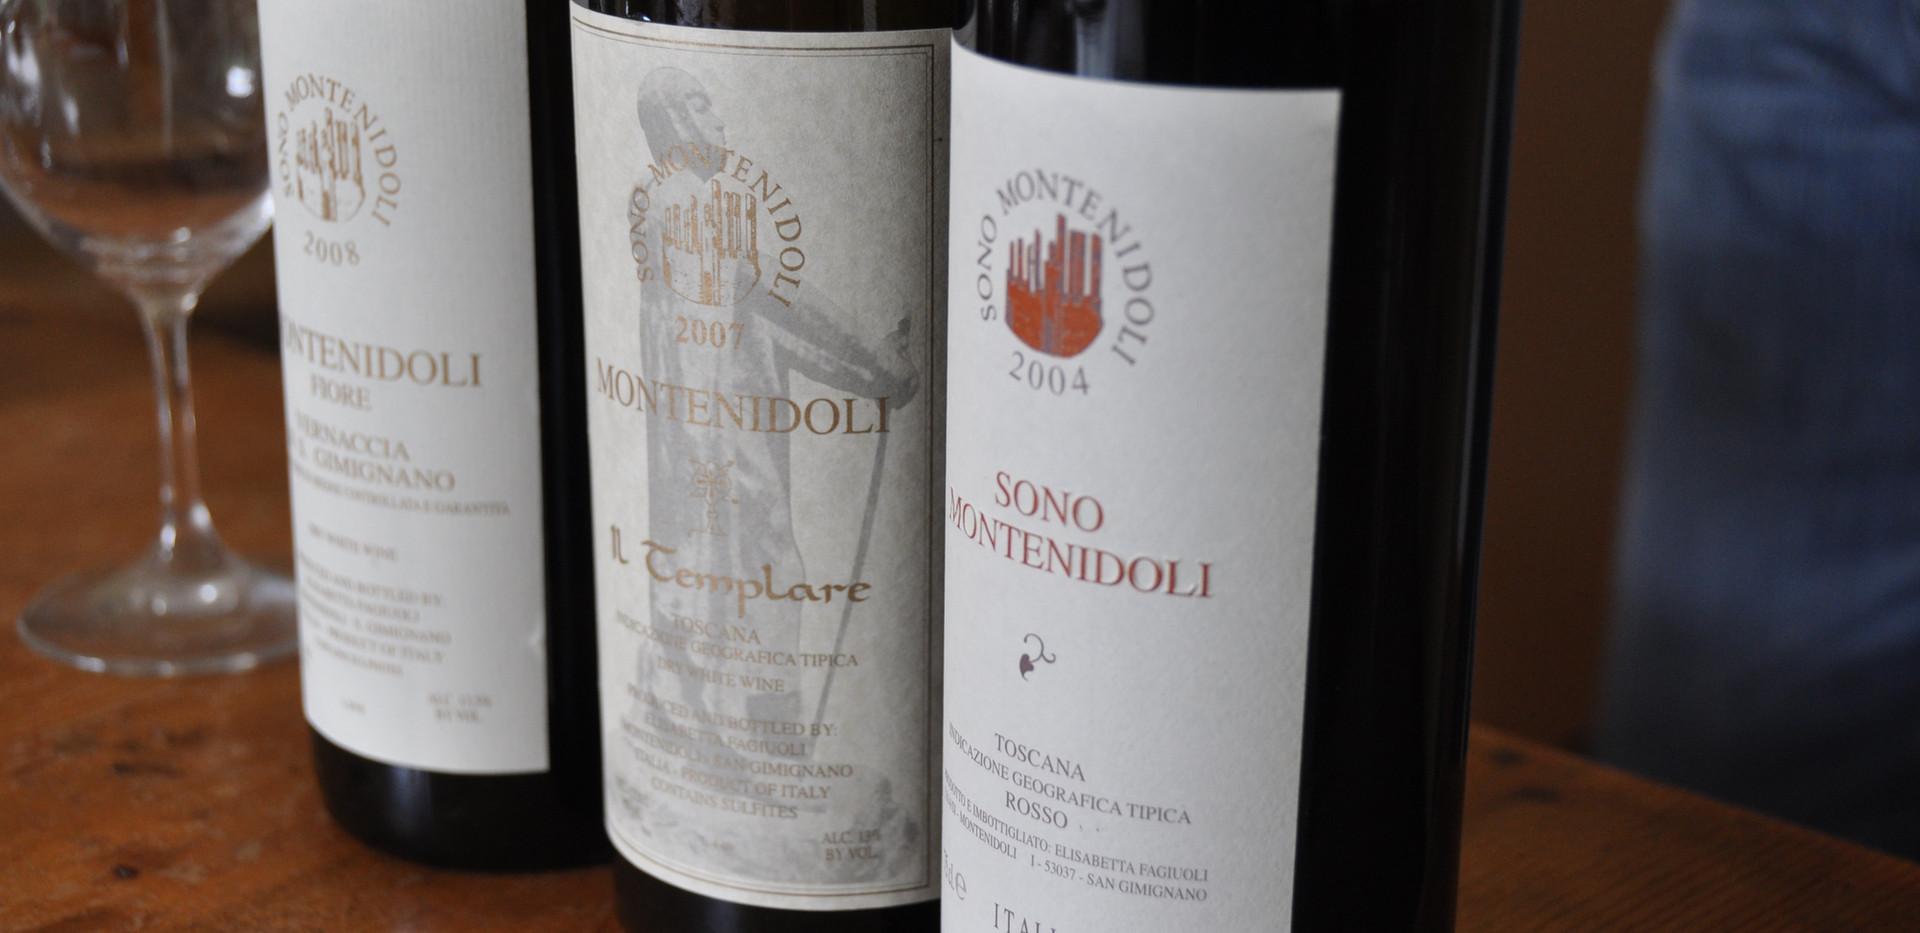 Taste iconic wines of the region